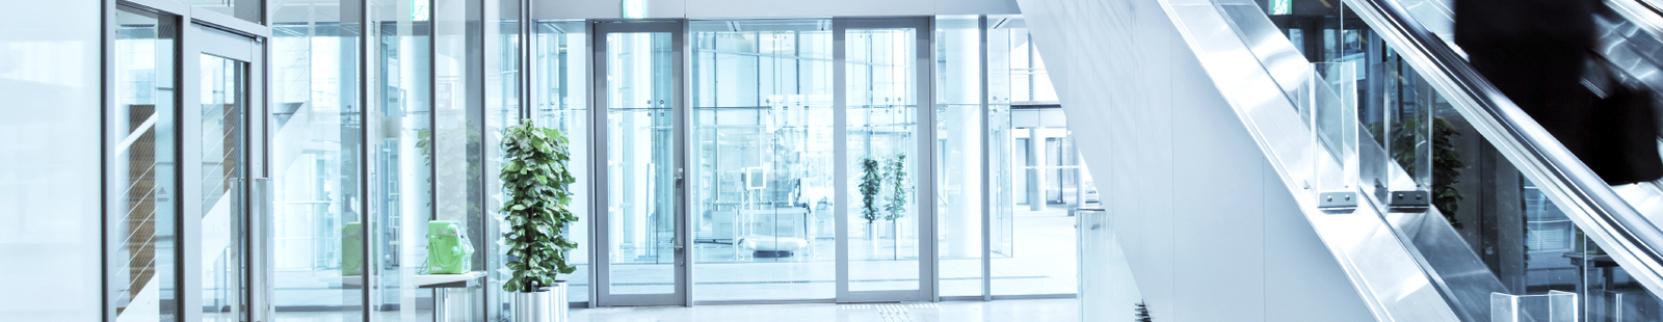 automatische Türen München Reparatur